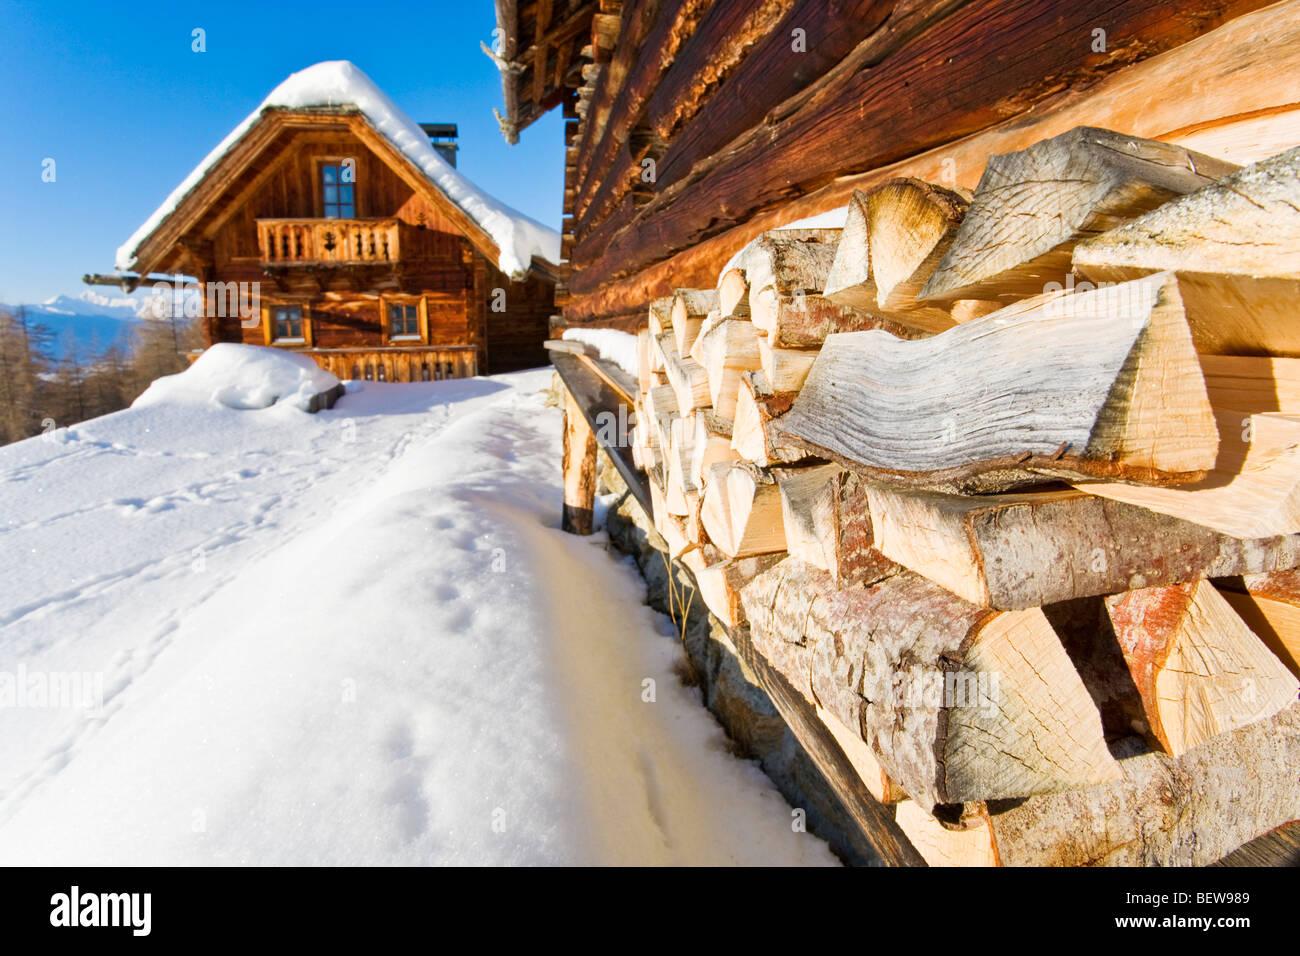 Snow-covered mountain refuge on an alp, Tamsweg, Salzburger Land, Austria - Stock Image